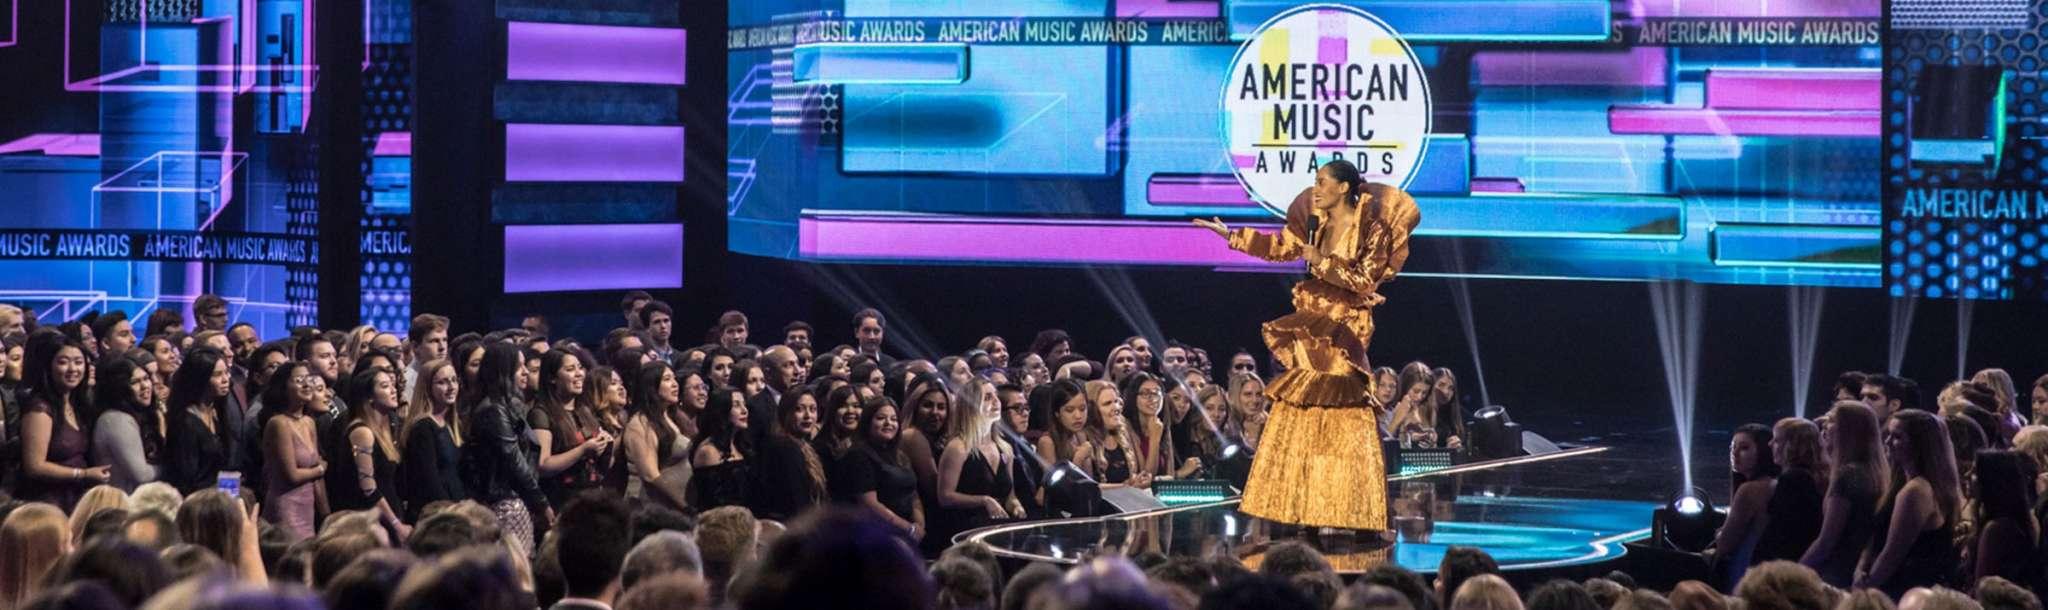 2018 American Music Awards Highlights Spains No1 English